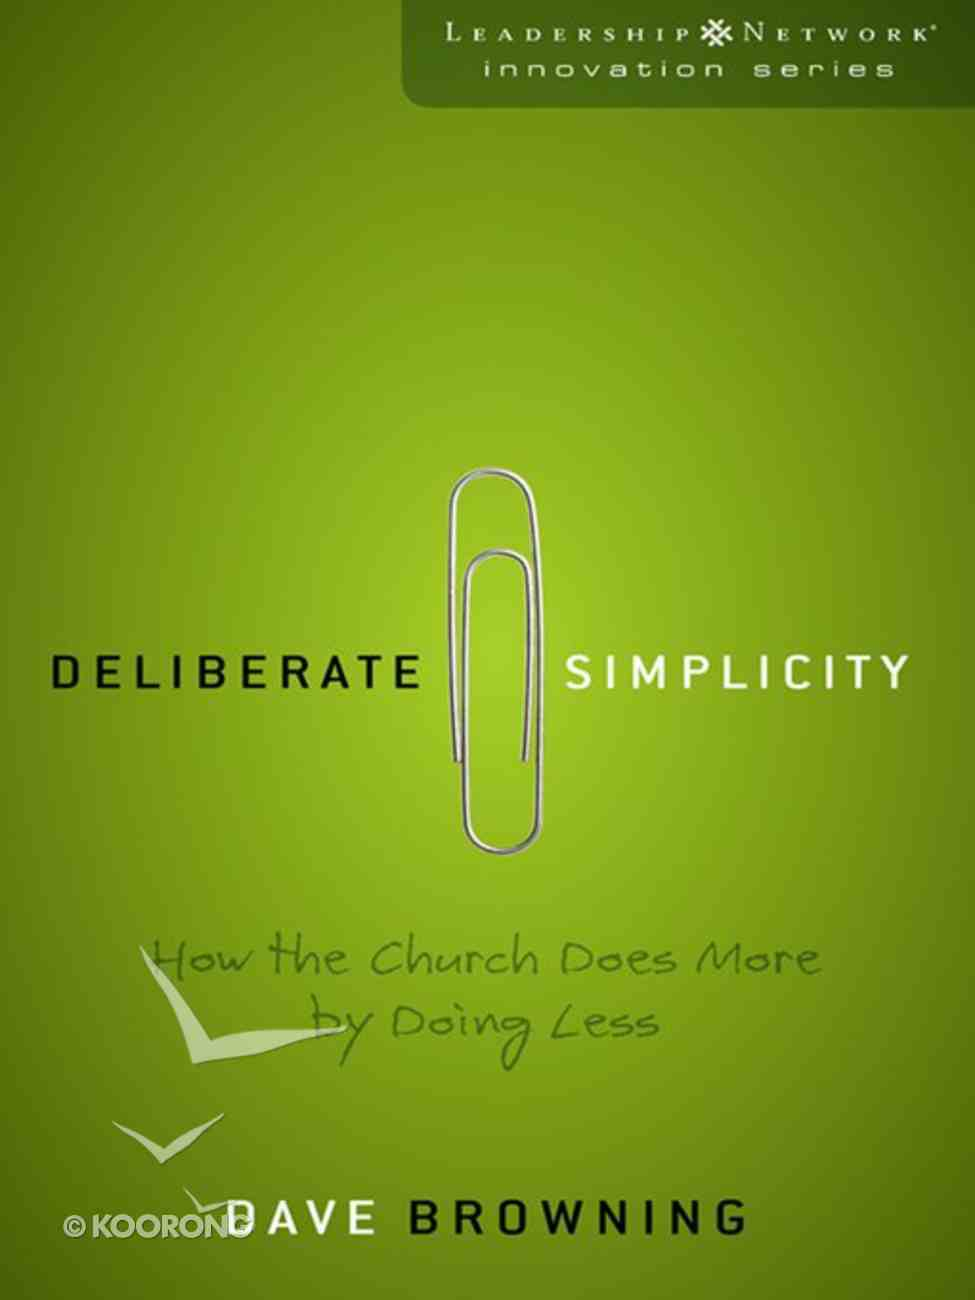 Deliberate Simplicity (Leadership Network Innovation Series) eBook